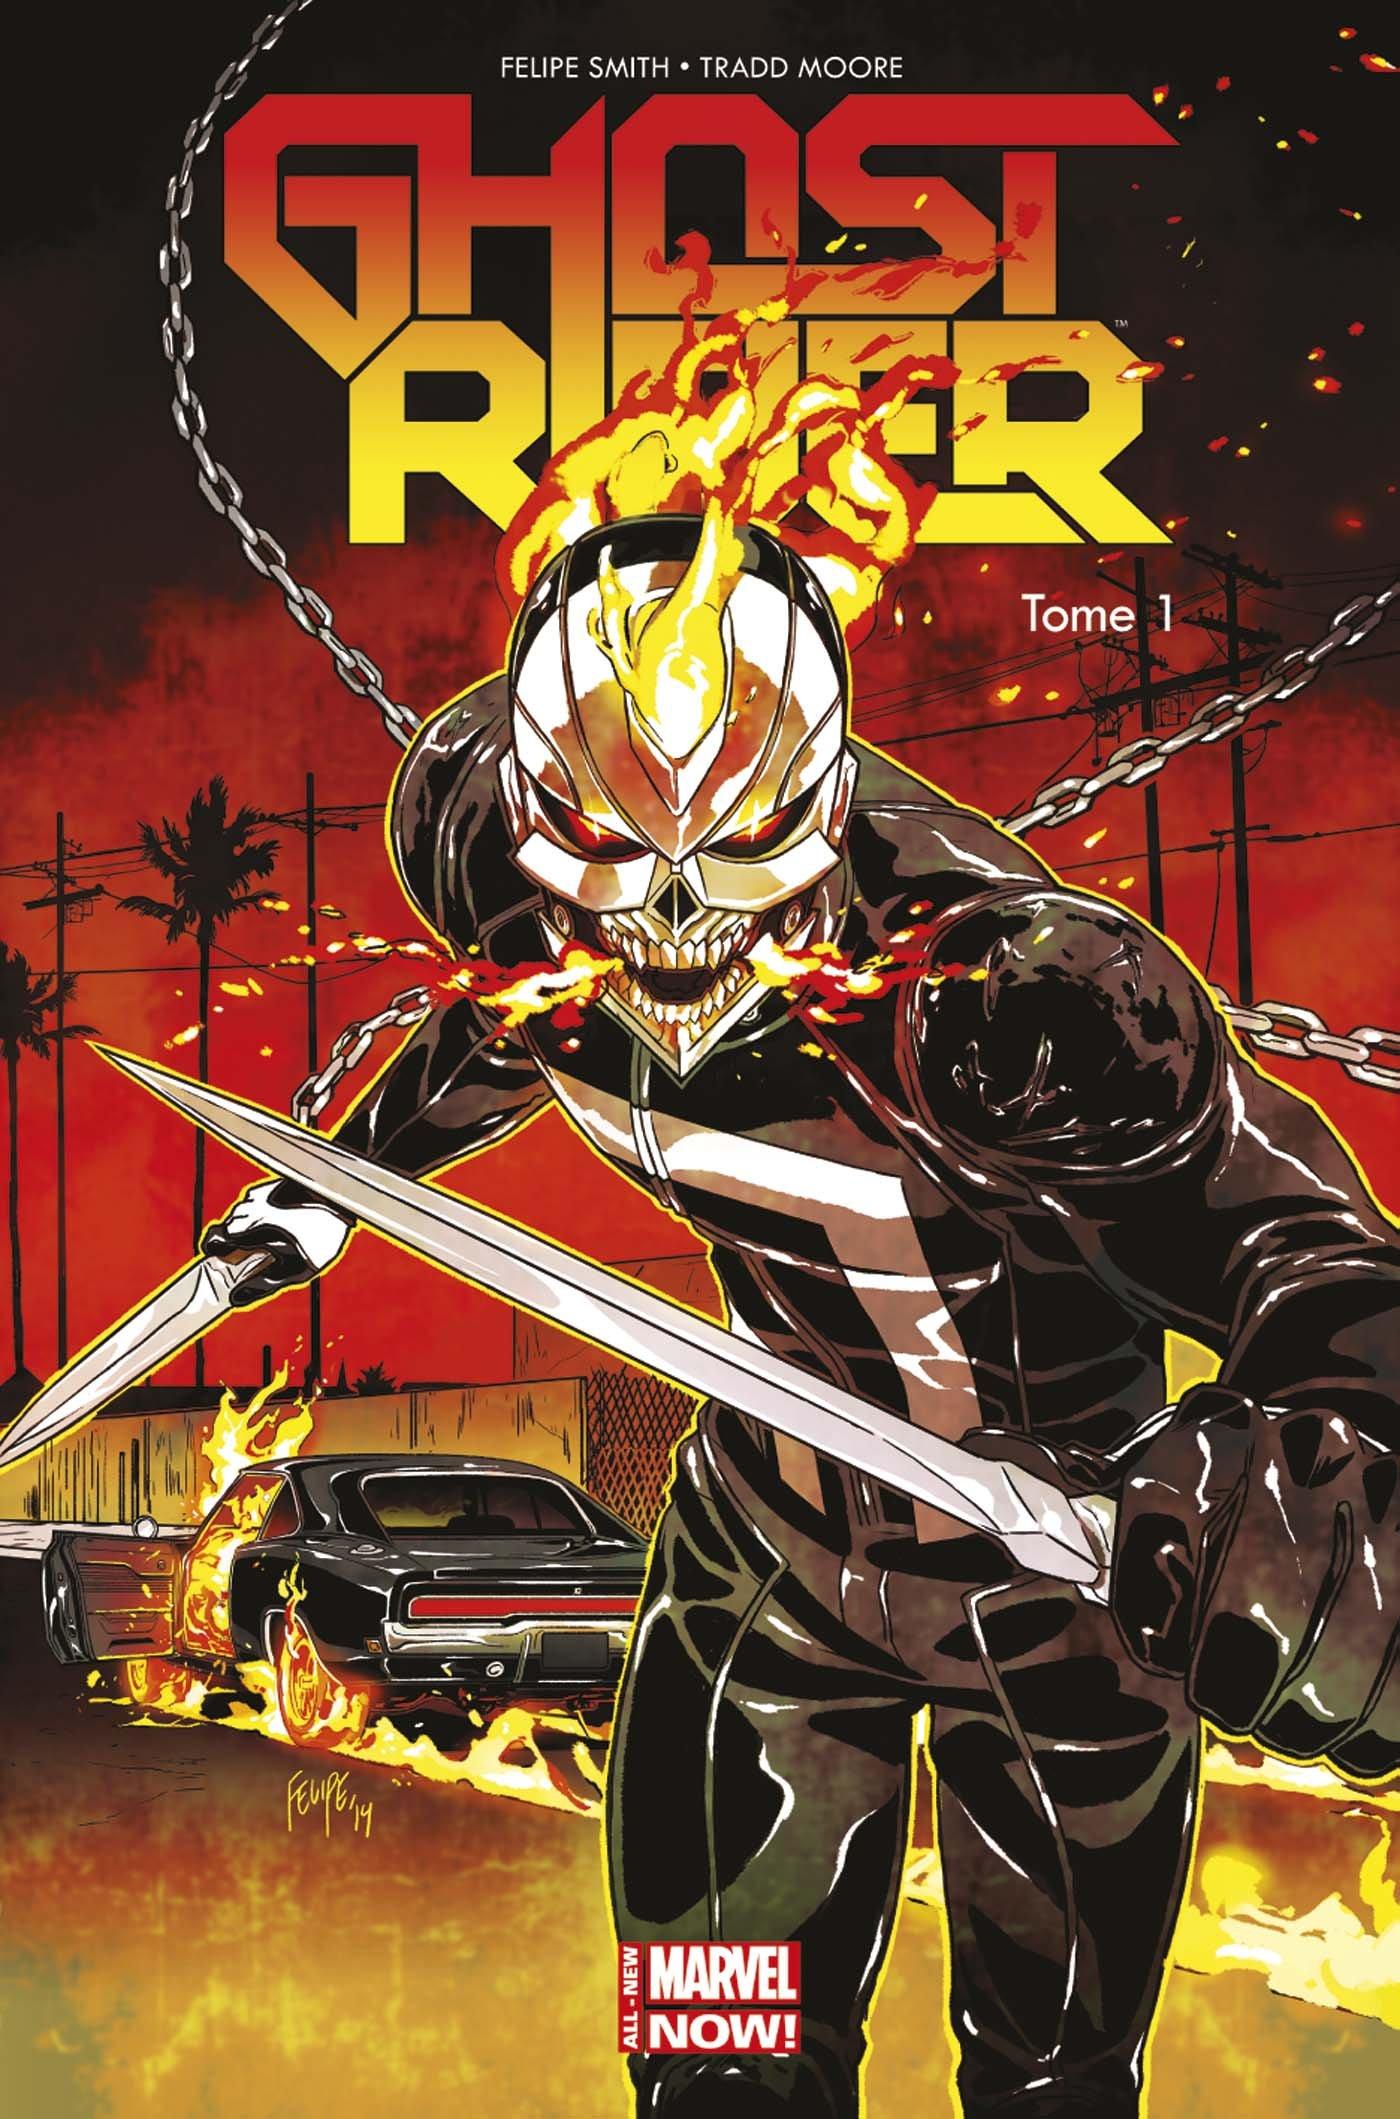 Ghost Rider T1 : Vengeance mécanique (0), comics chez Panini Comics de Smith, Moore, Sanz, Staples, Daniel